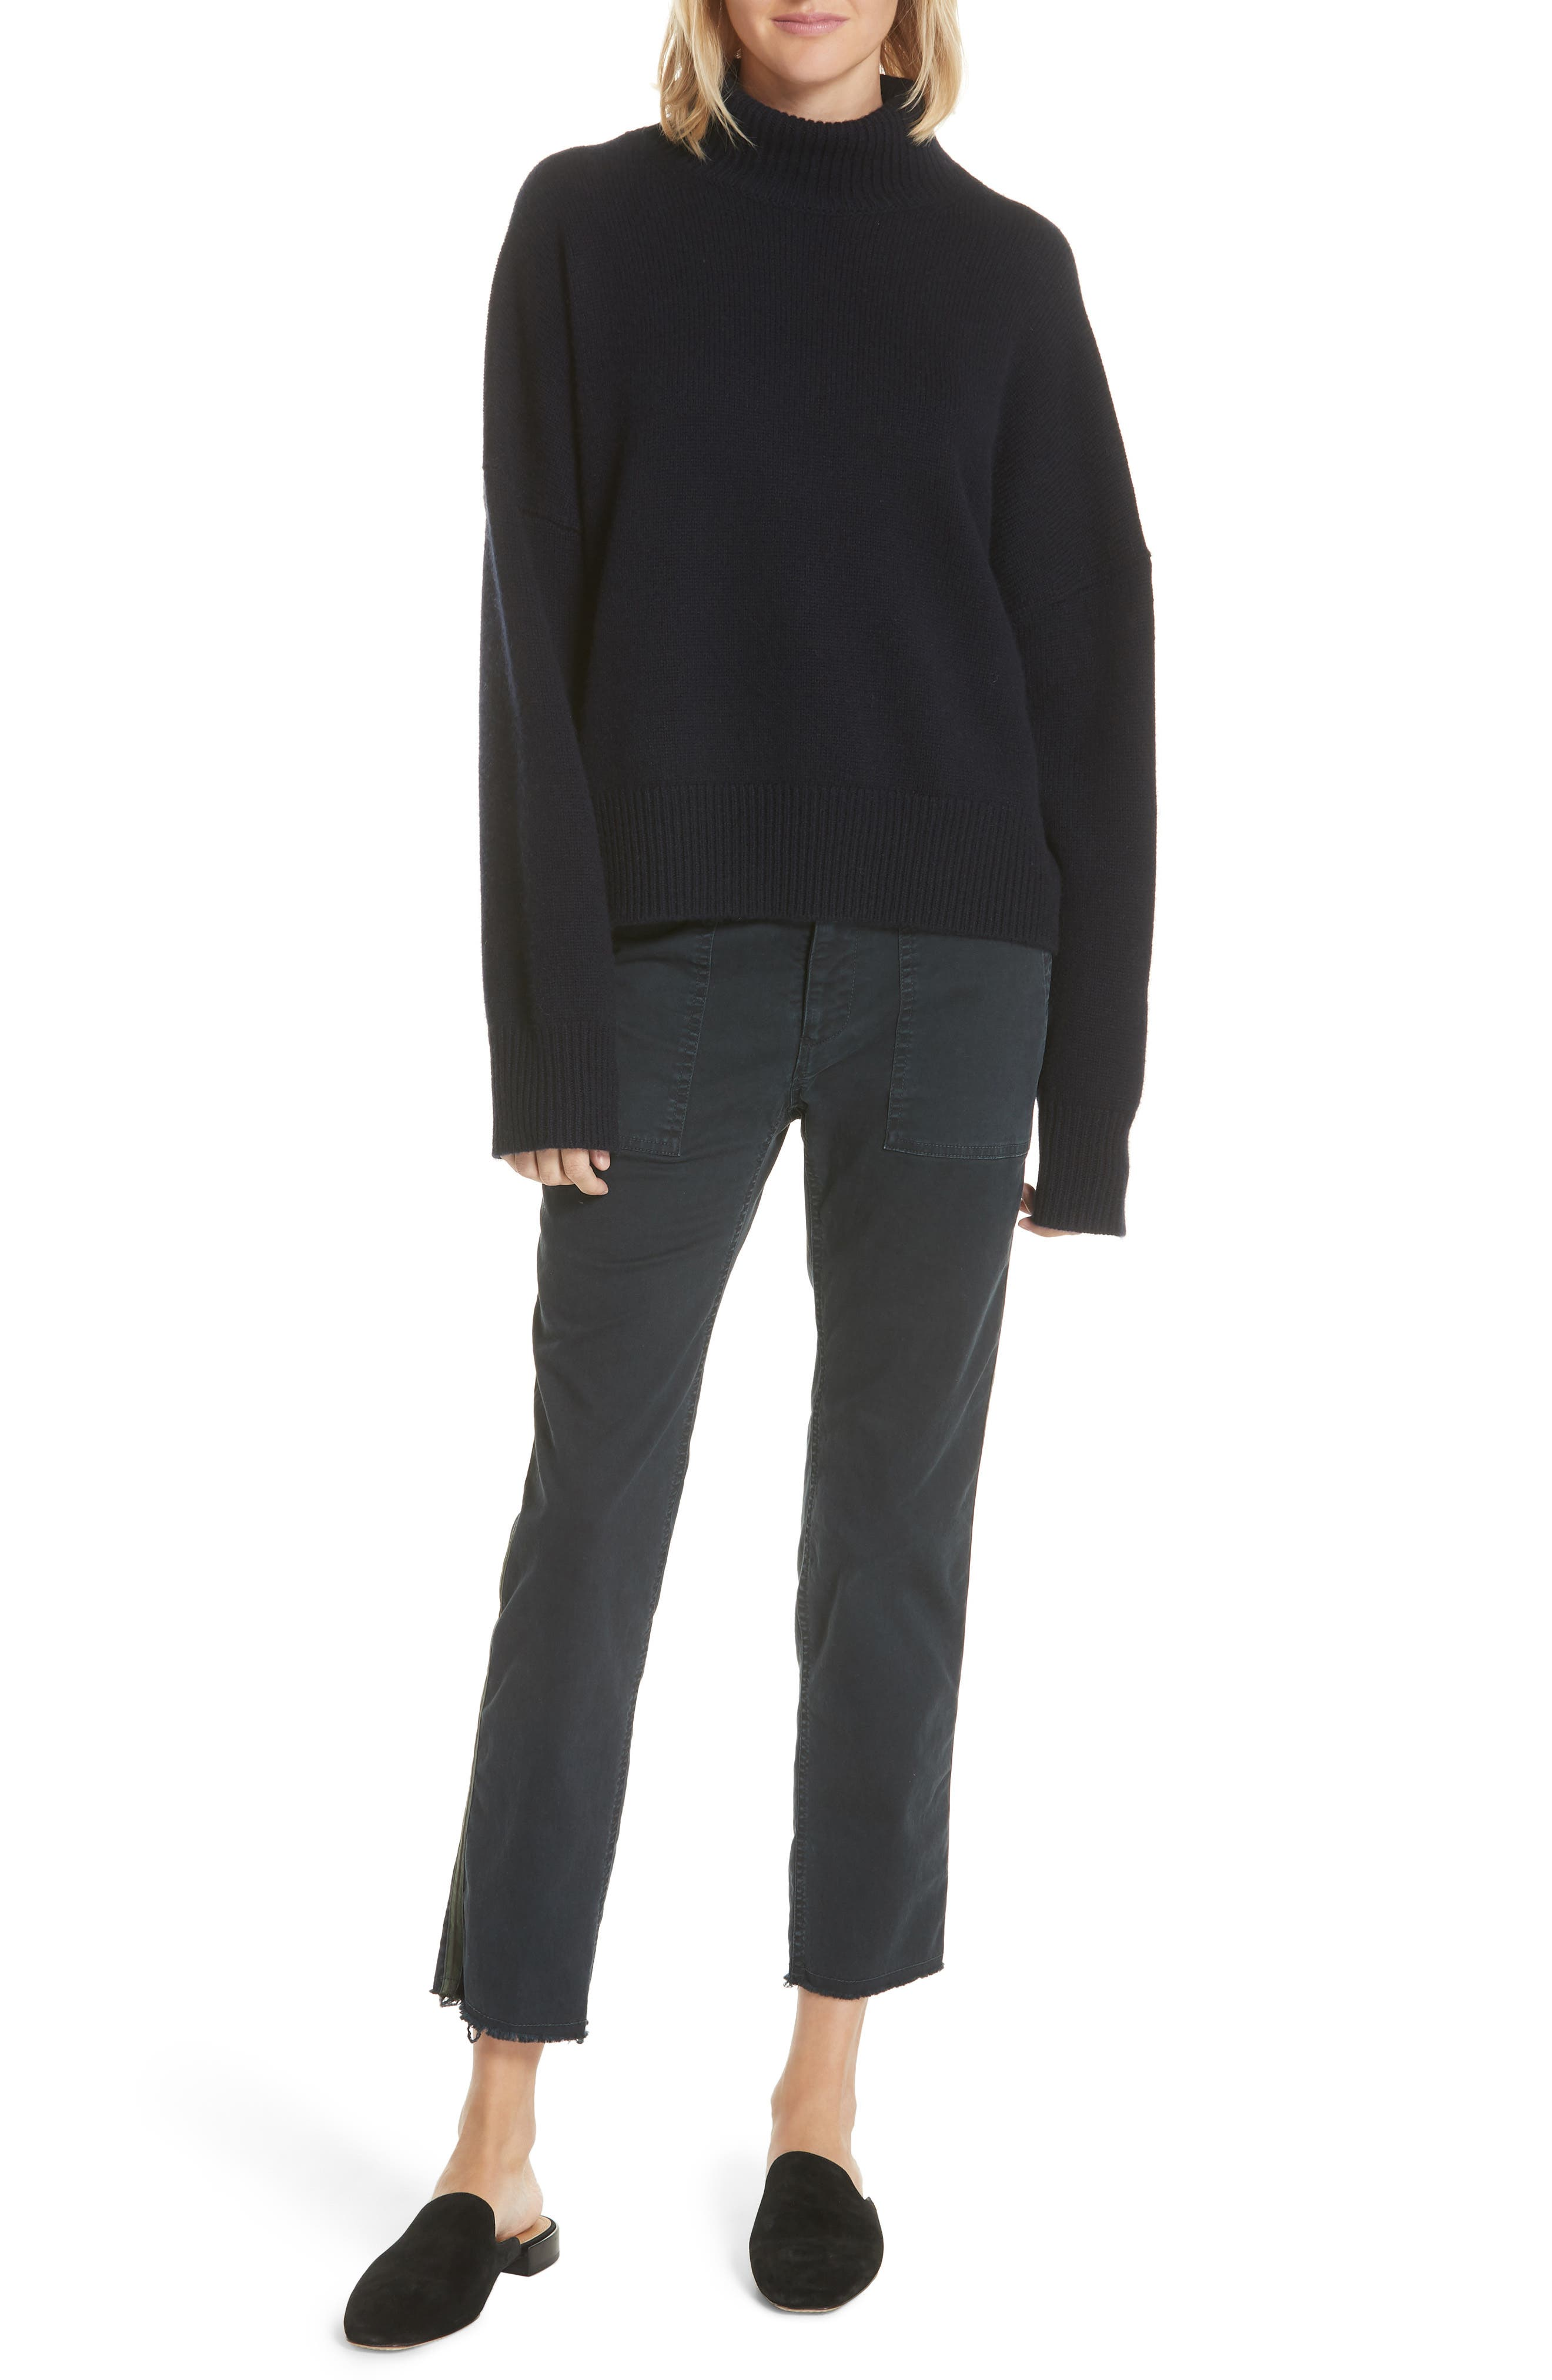 Serinda Wool & Cashmere Turtleneck Sweater,                             Alternate thumbnail 7, color,                             Dark Navy